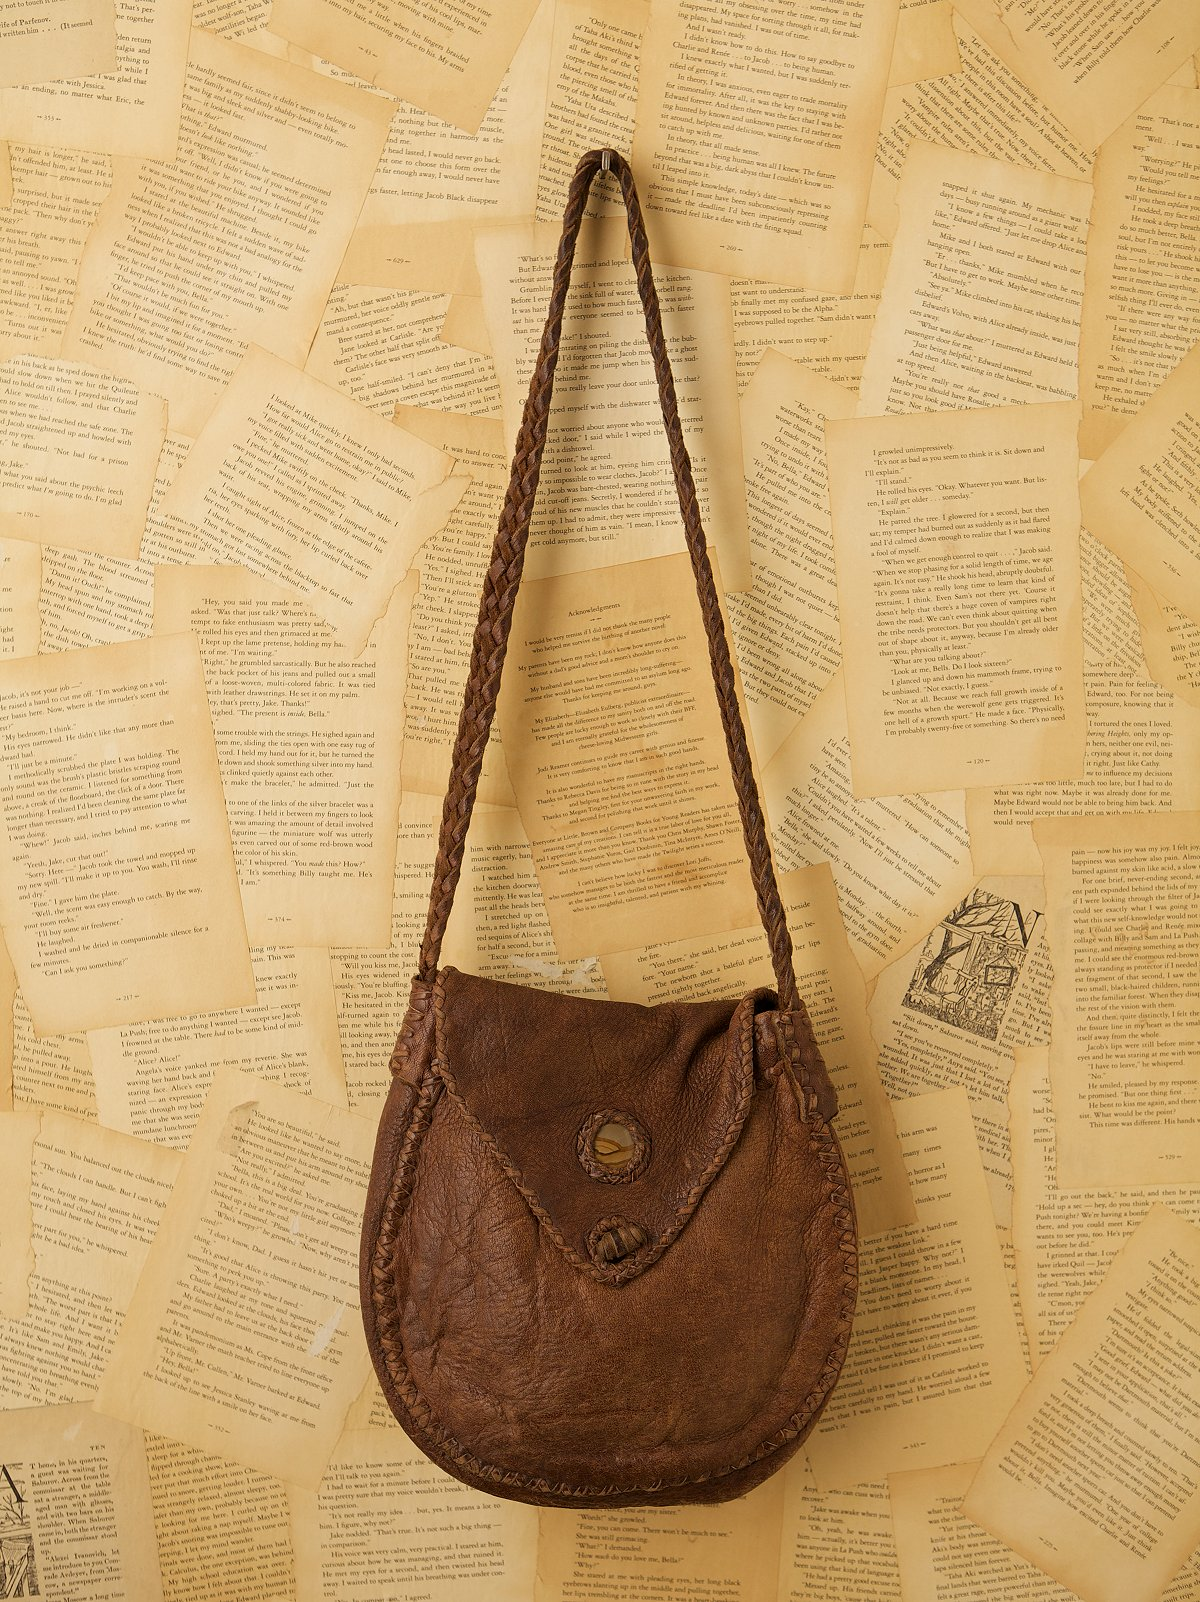 Vintage Woven Leather Satchel